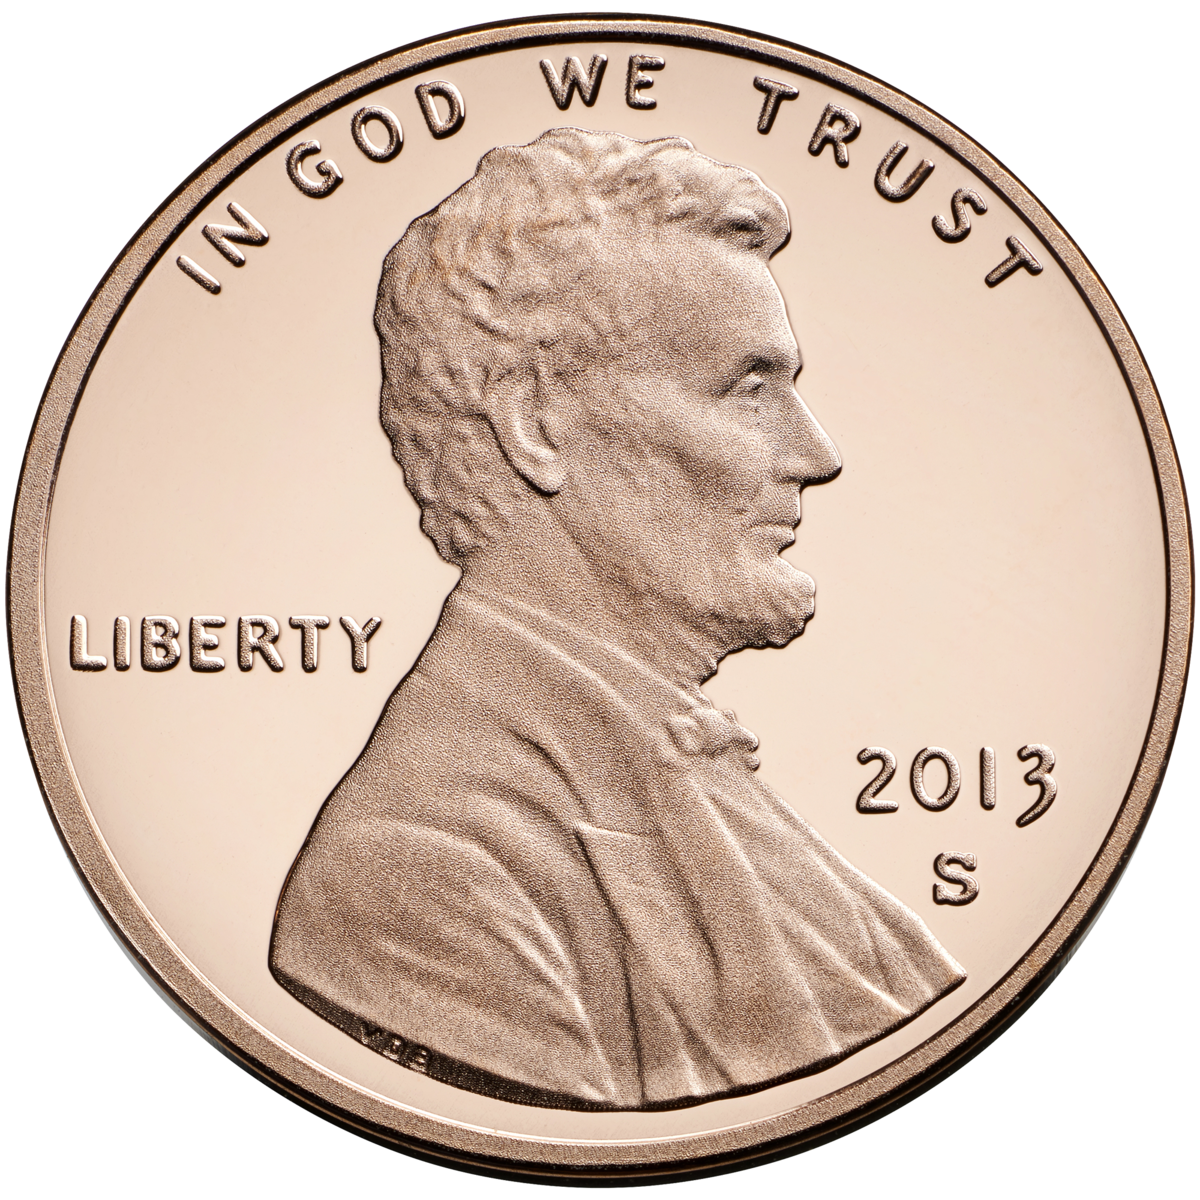 Money clipart for teachers clipart Coins PNG For Teachers Transparent Coins For Teachers.PNG Images ... clipart